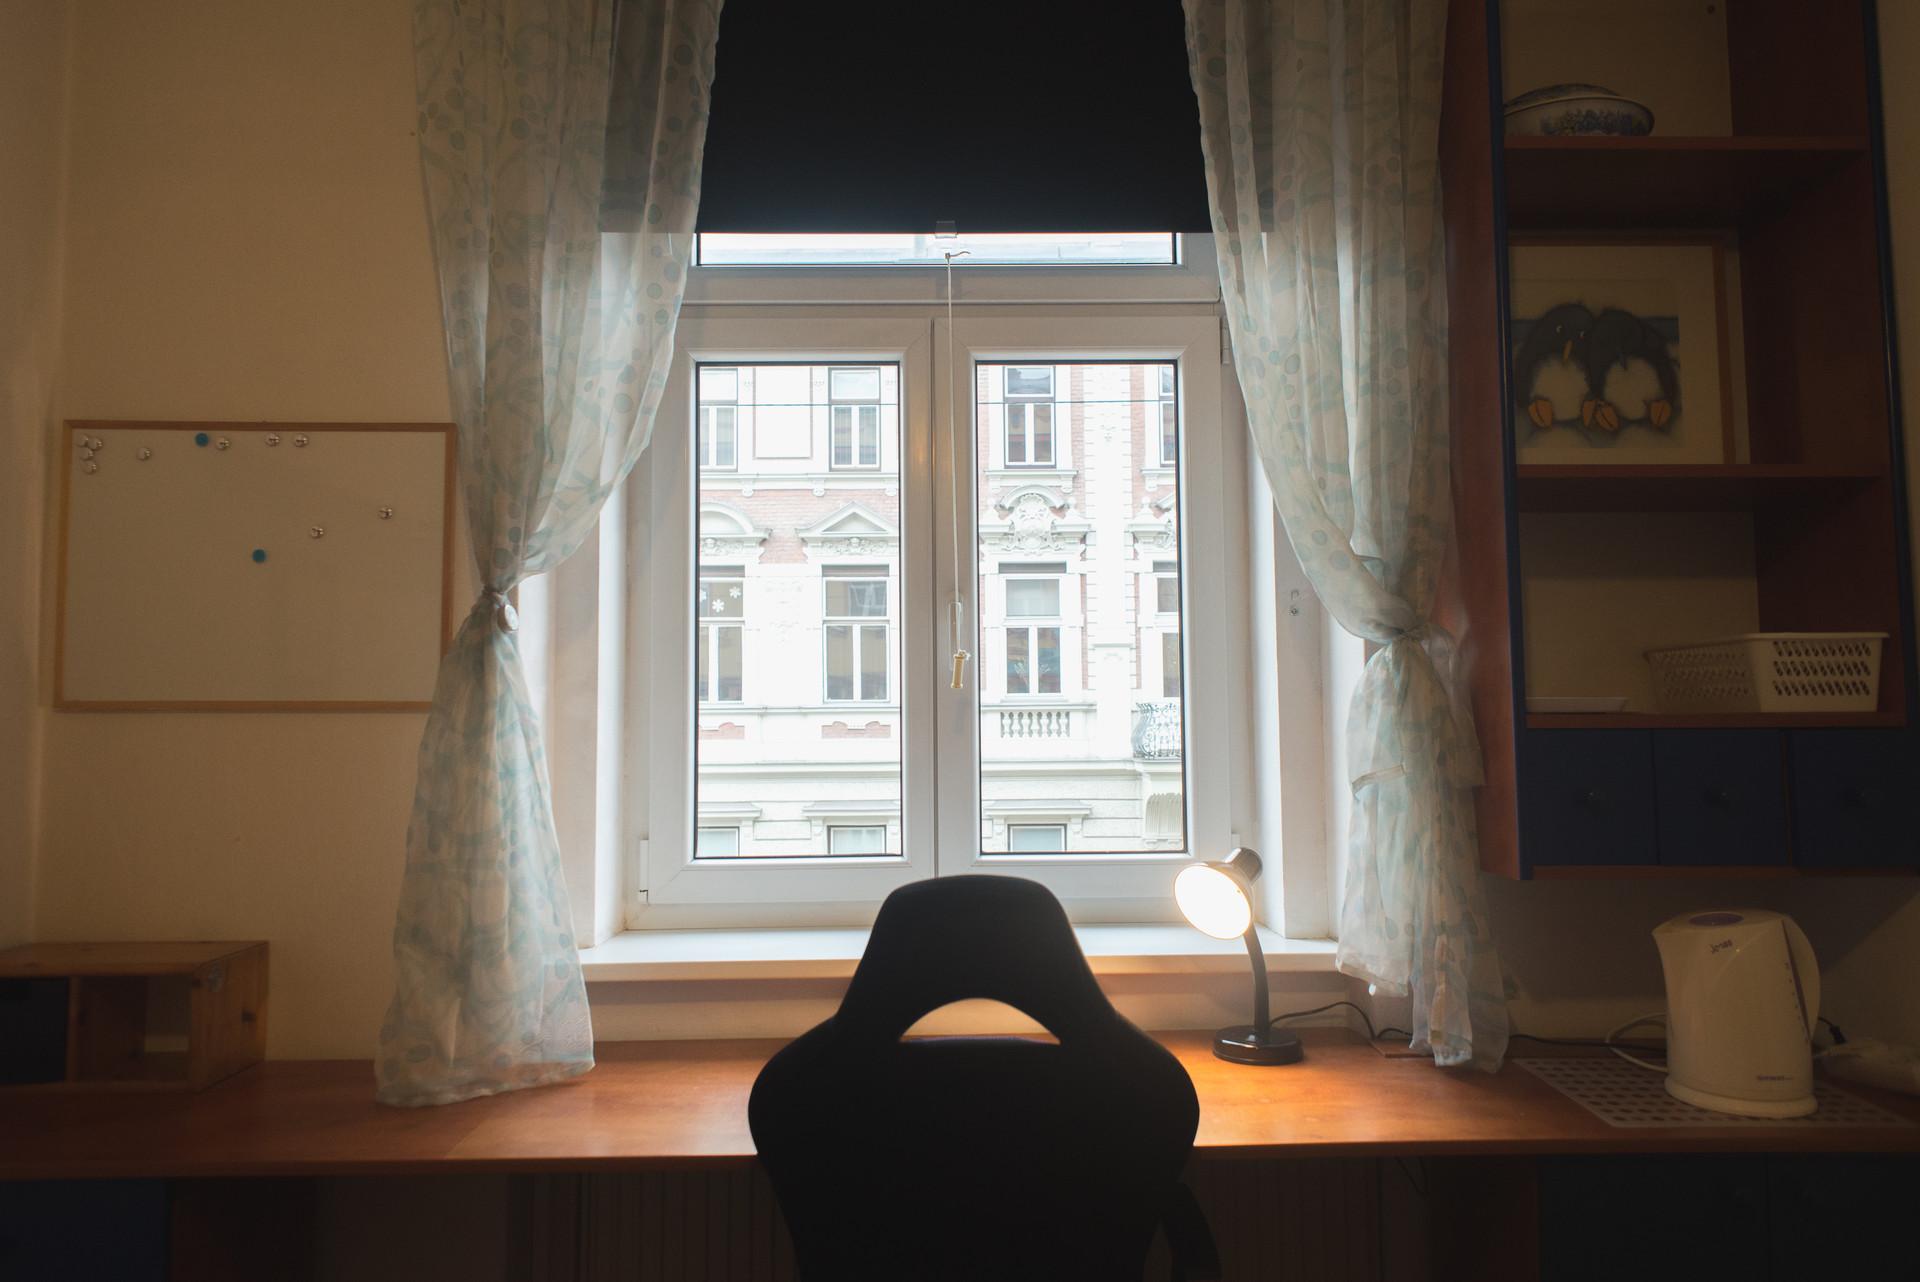 rooms-strict-centre-c078e522d994ae08a720660ac9dddcaa